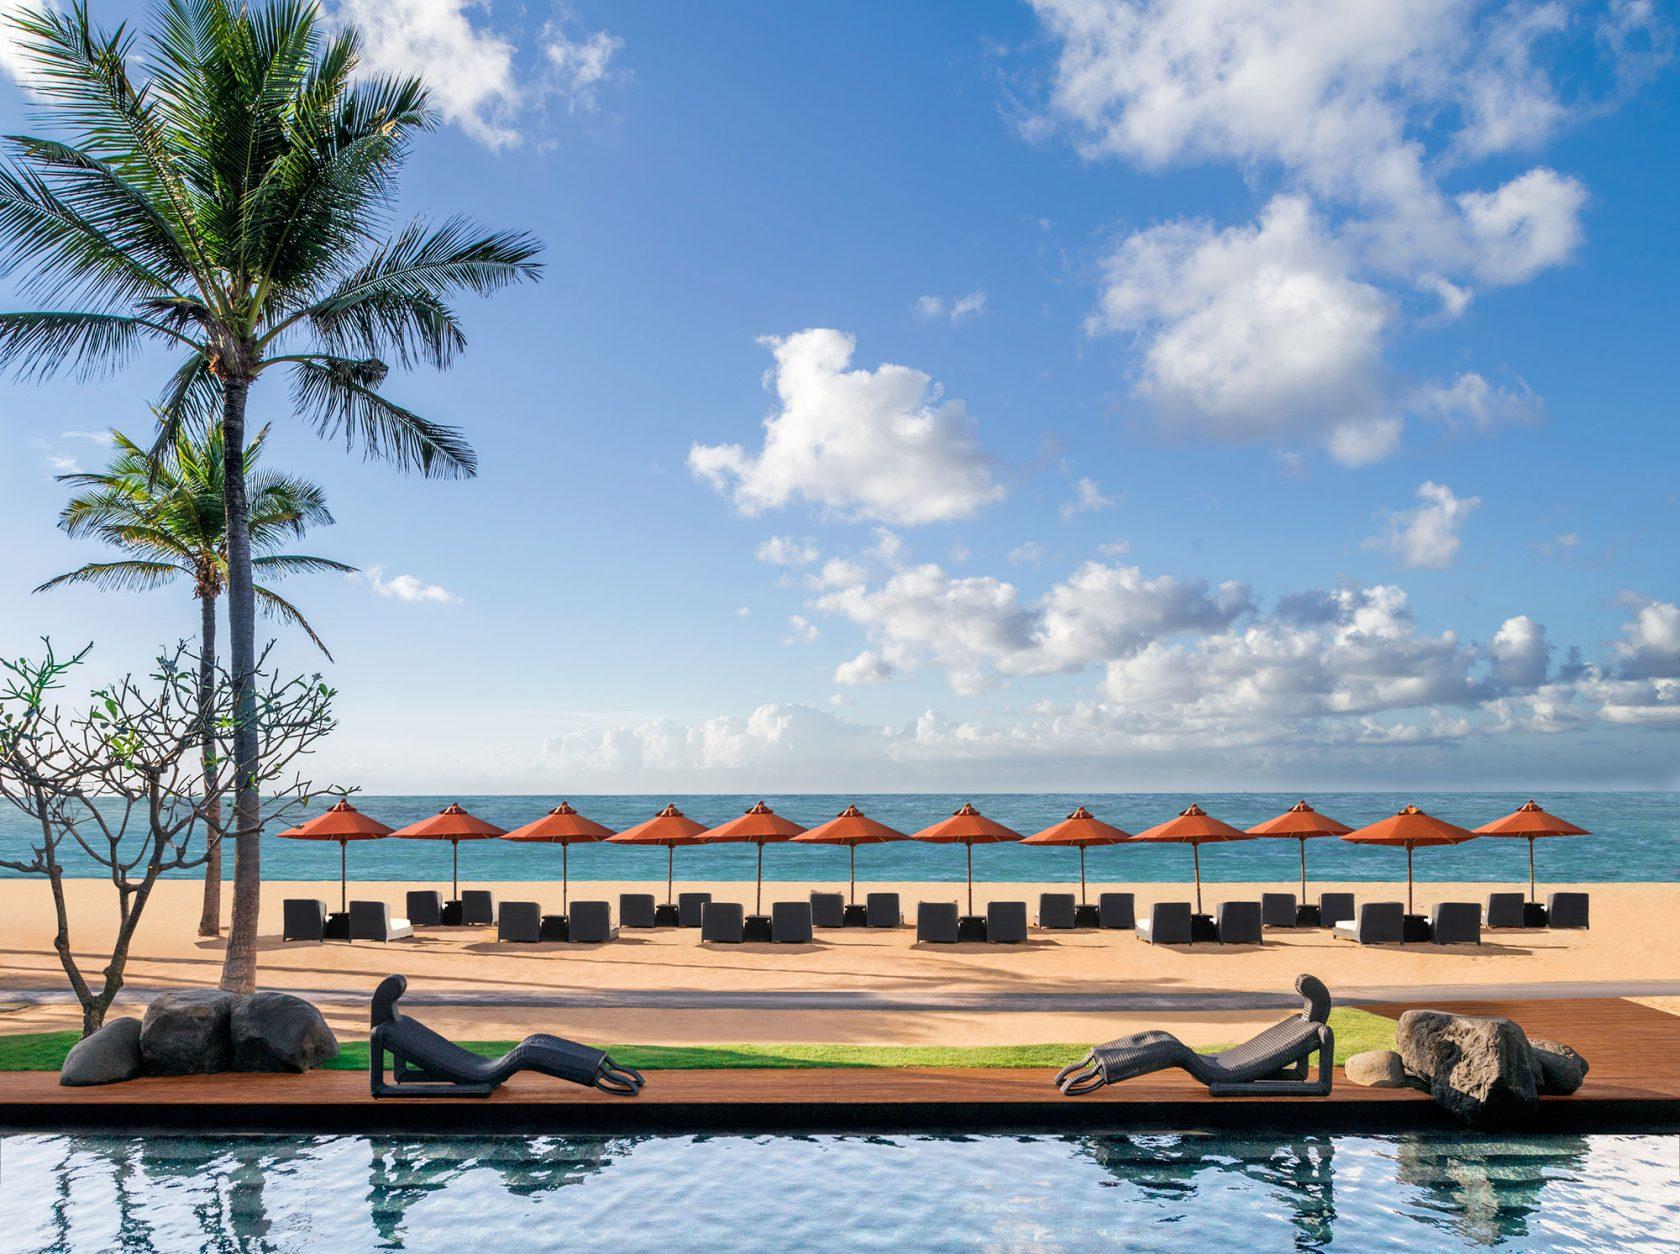 The St. Regis Bali Beach and Pool